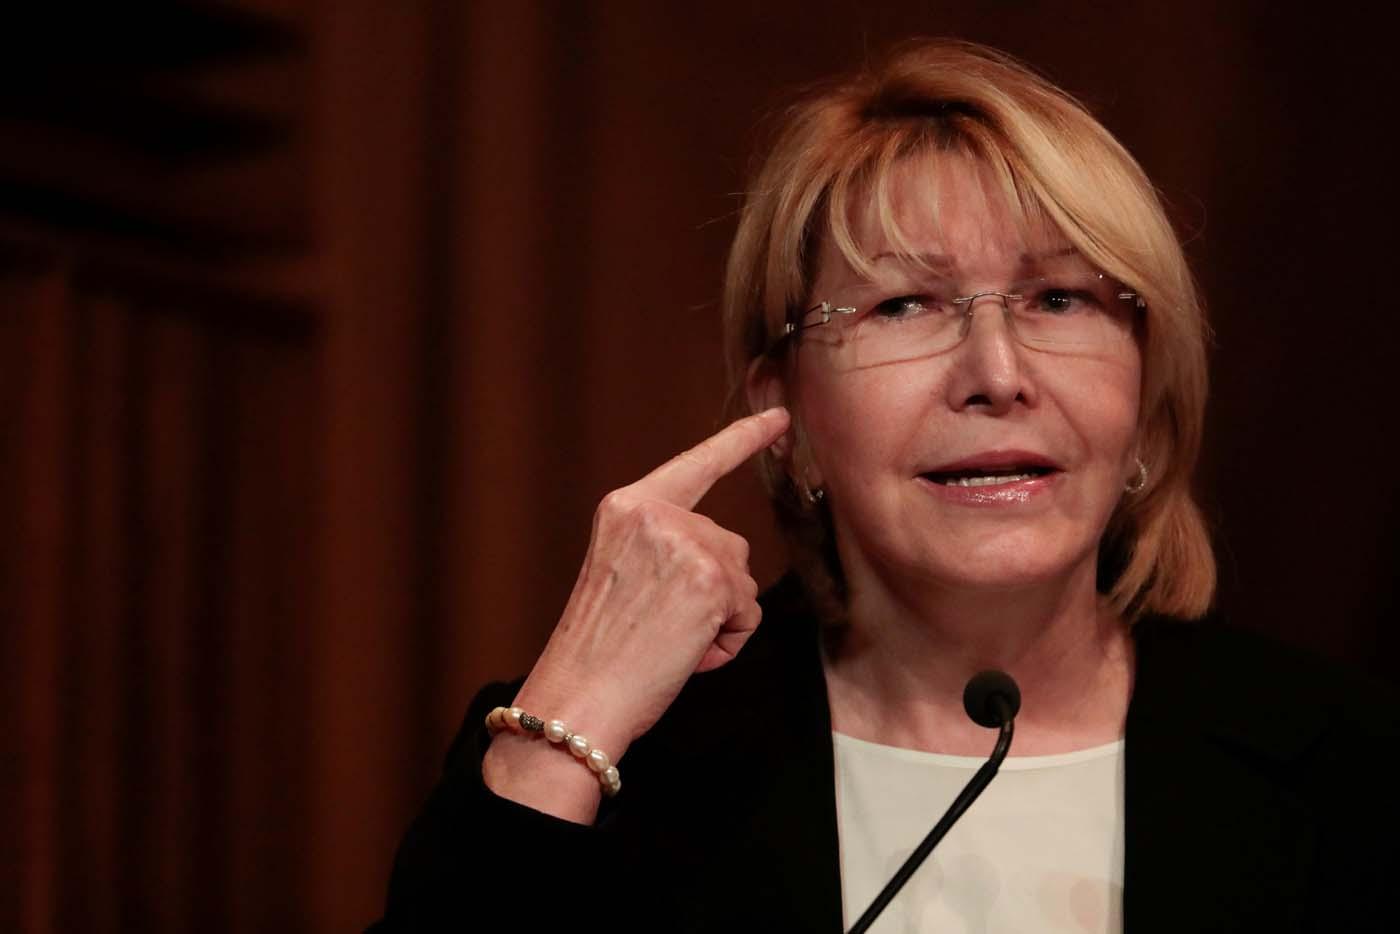 La fiscal general Luisa Ortega Díaz. REUTERS/Marco Bello